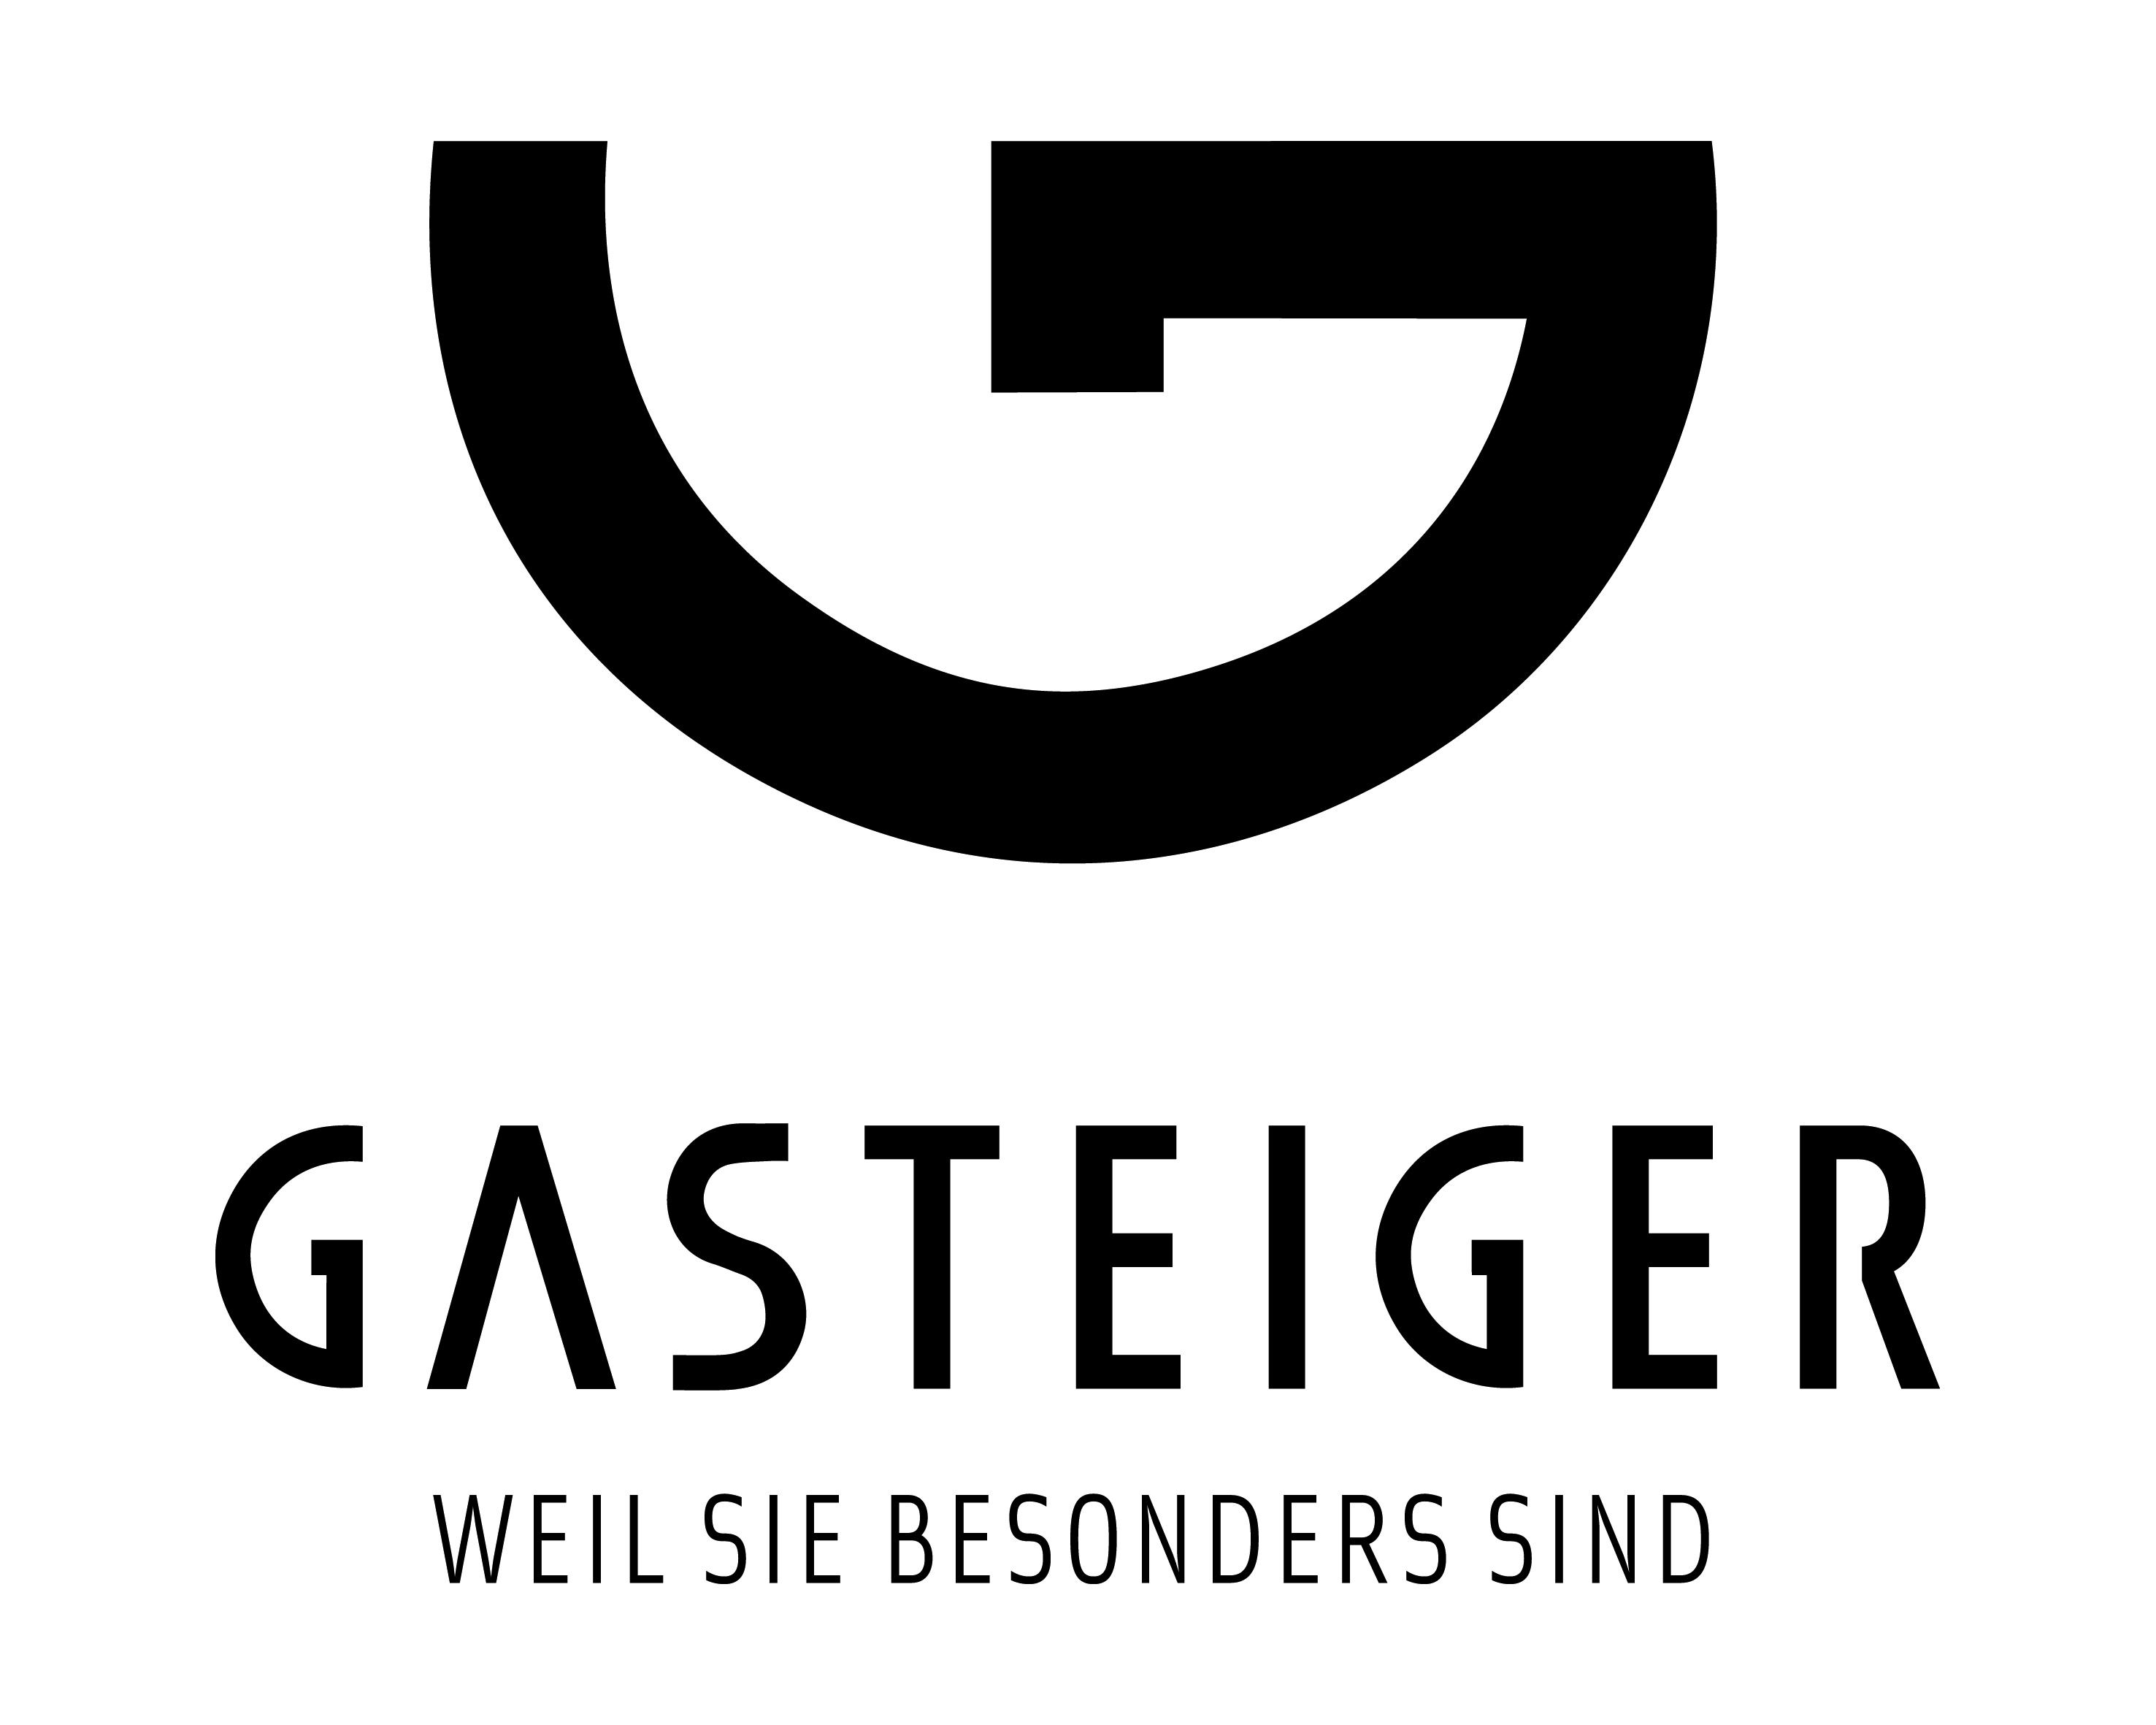 Gasteiger.Design